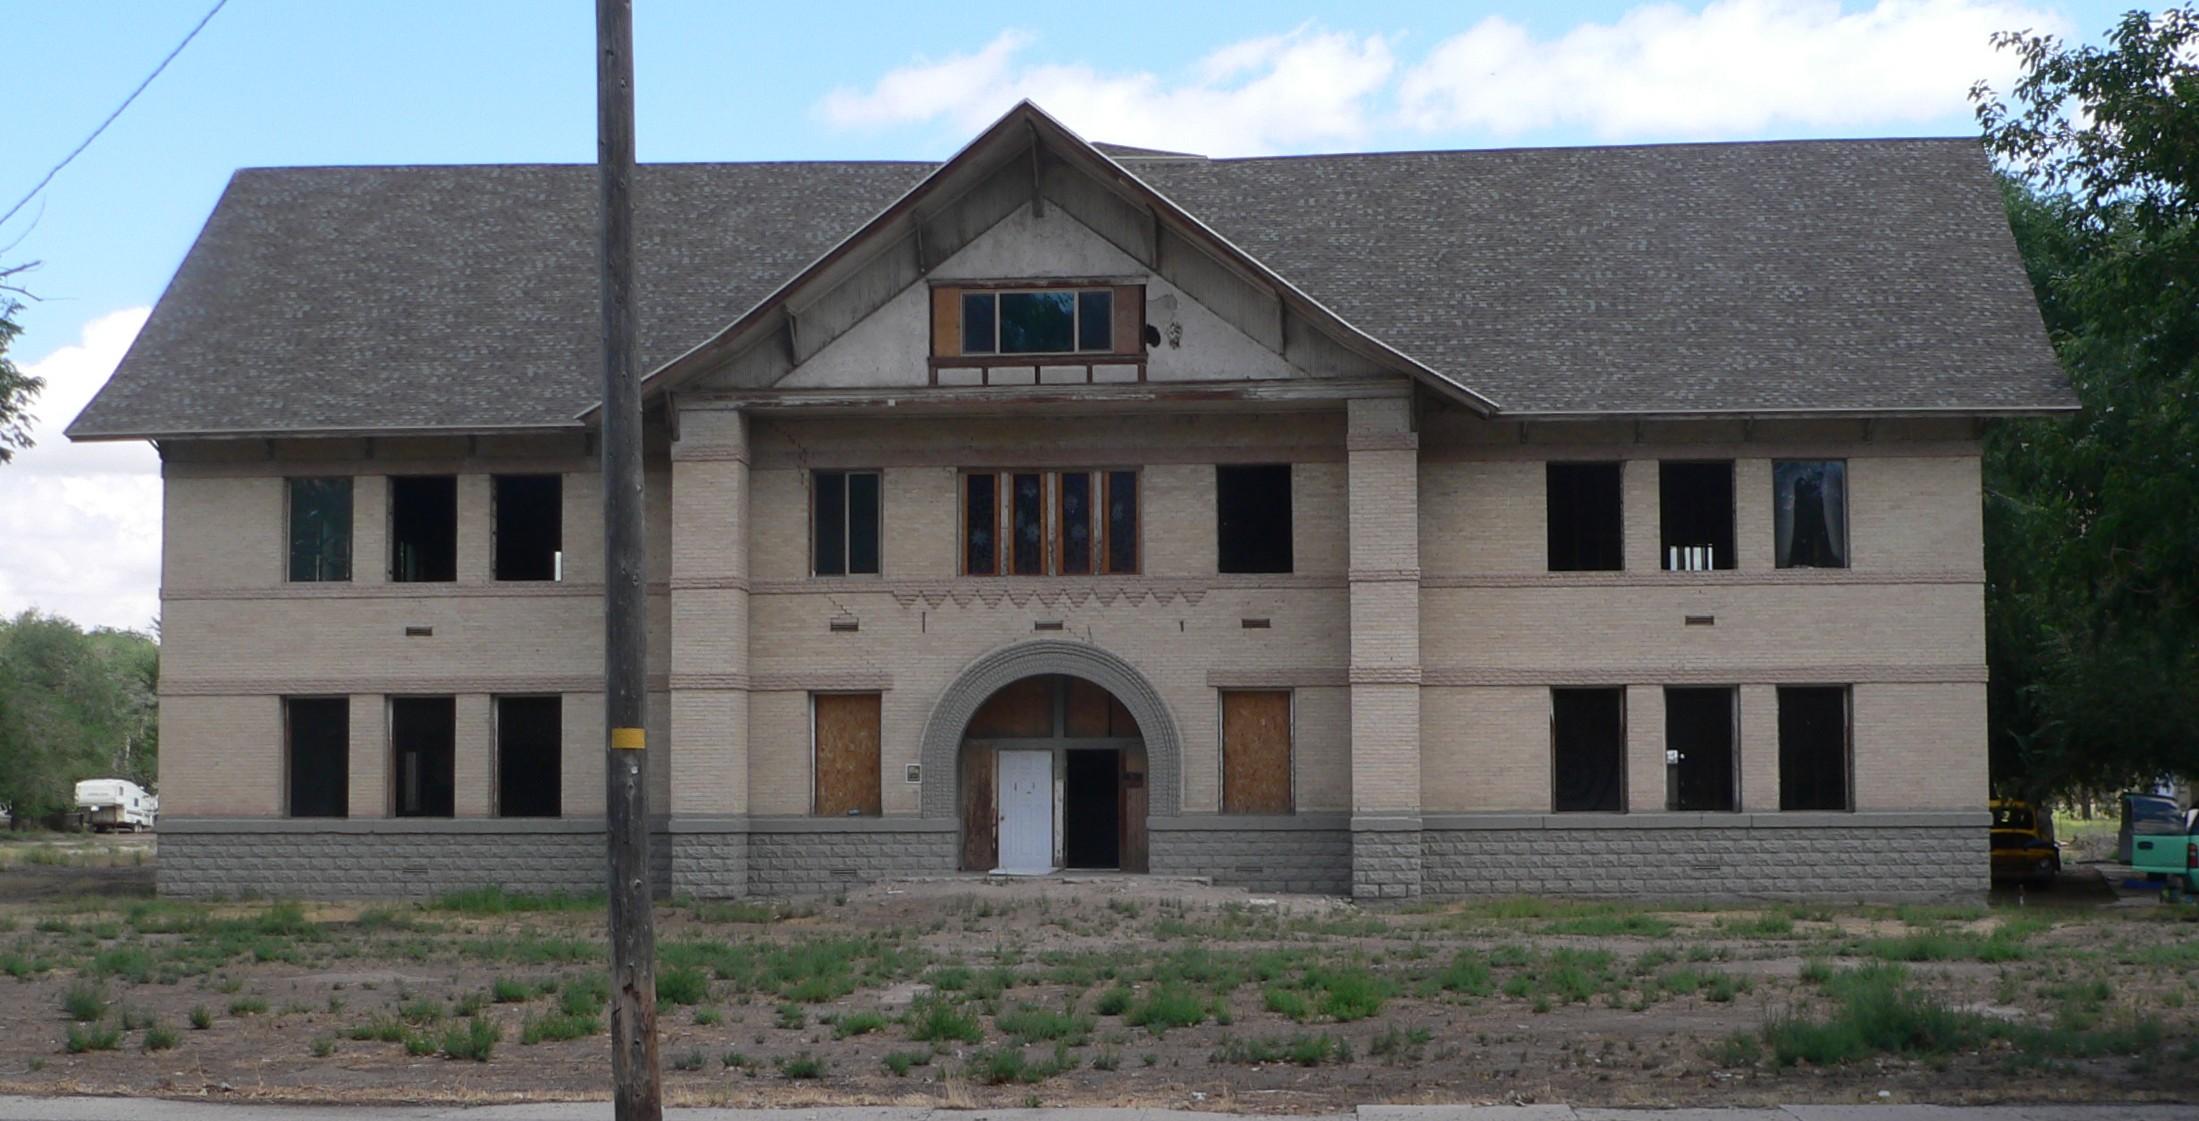 File:Millard Academy (Hinckley, UT) from W 1.JPG - Wikimedia Commons